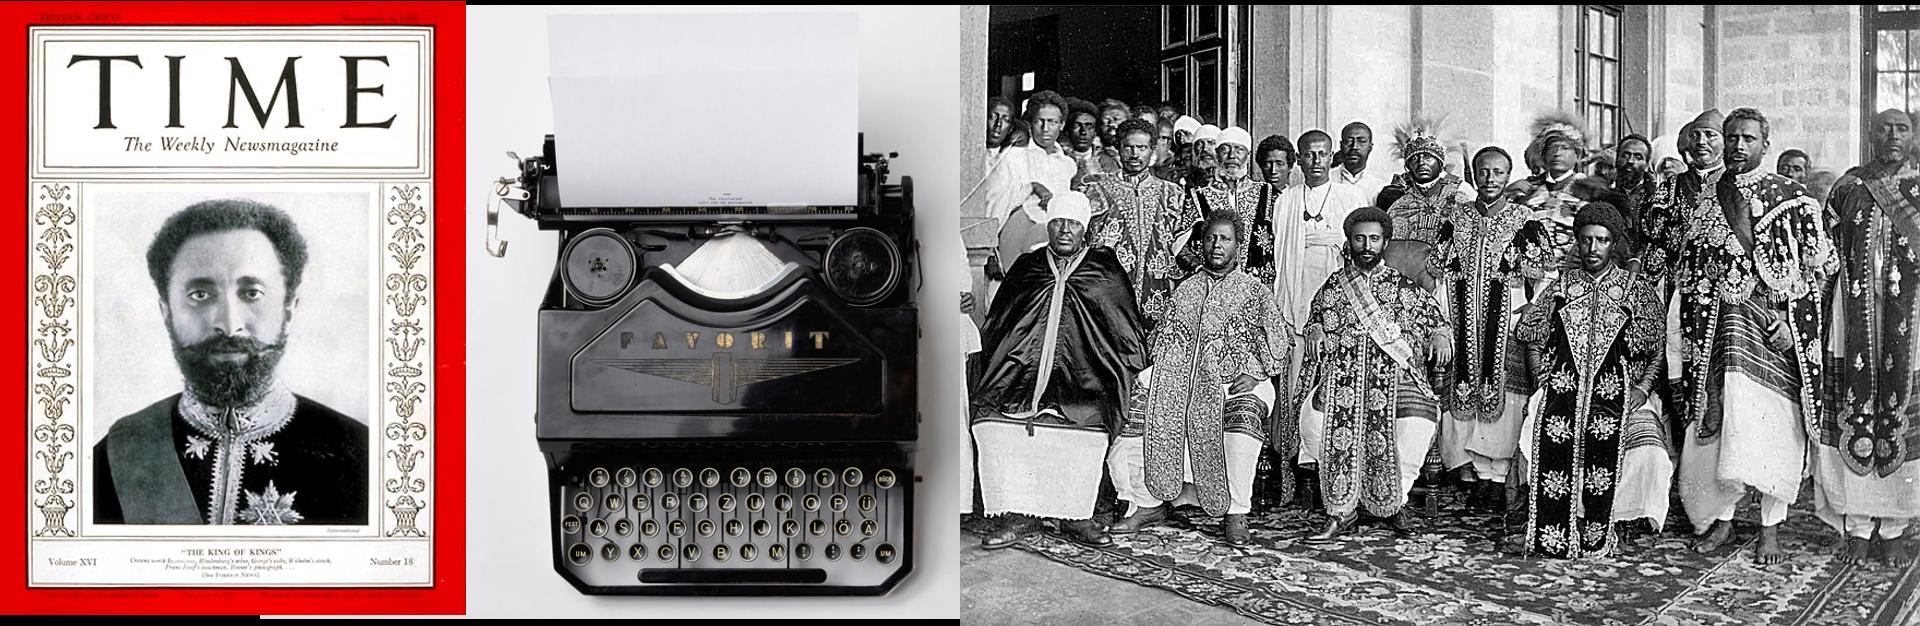 Waugh's typewriter, Haile Selassie